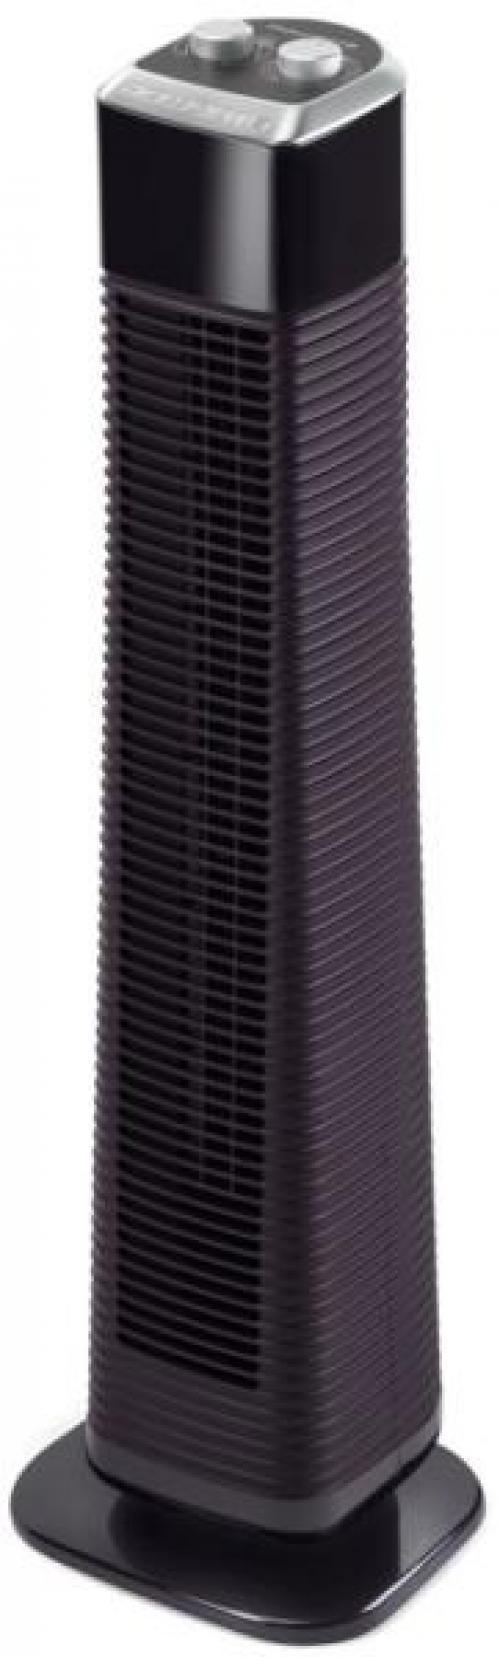 Rowenta VU6140F0 Classic oszlop ventilátor | DigitalPlaza.hu